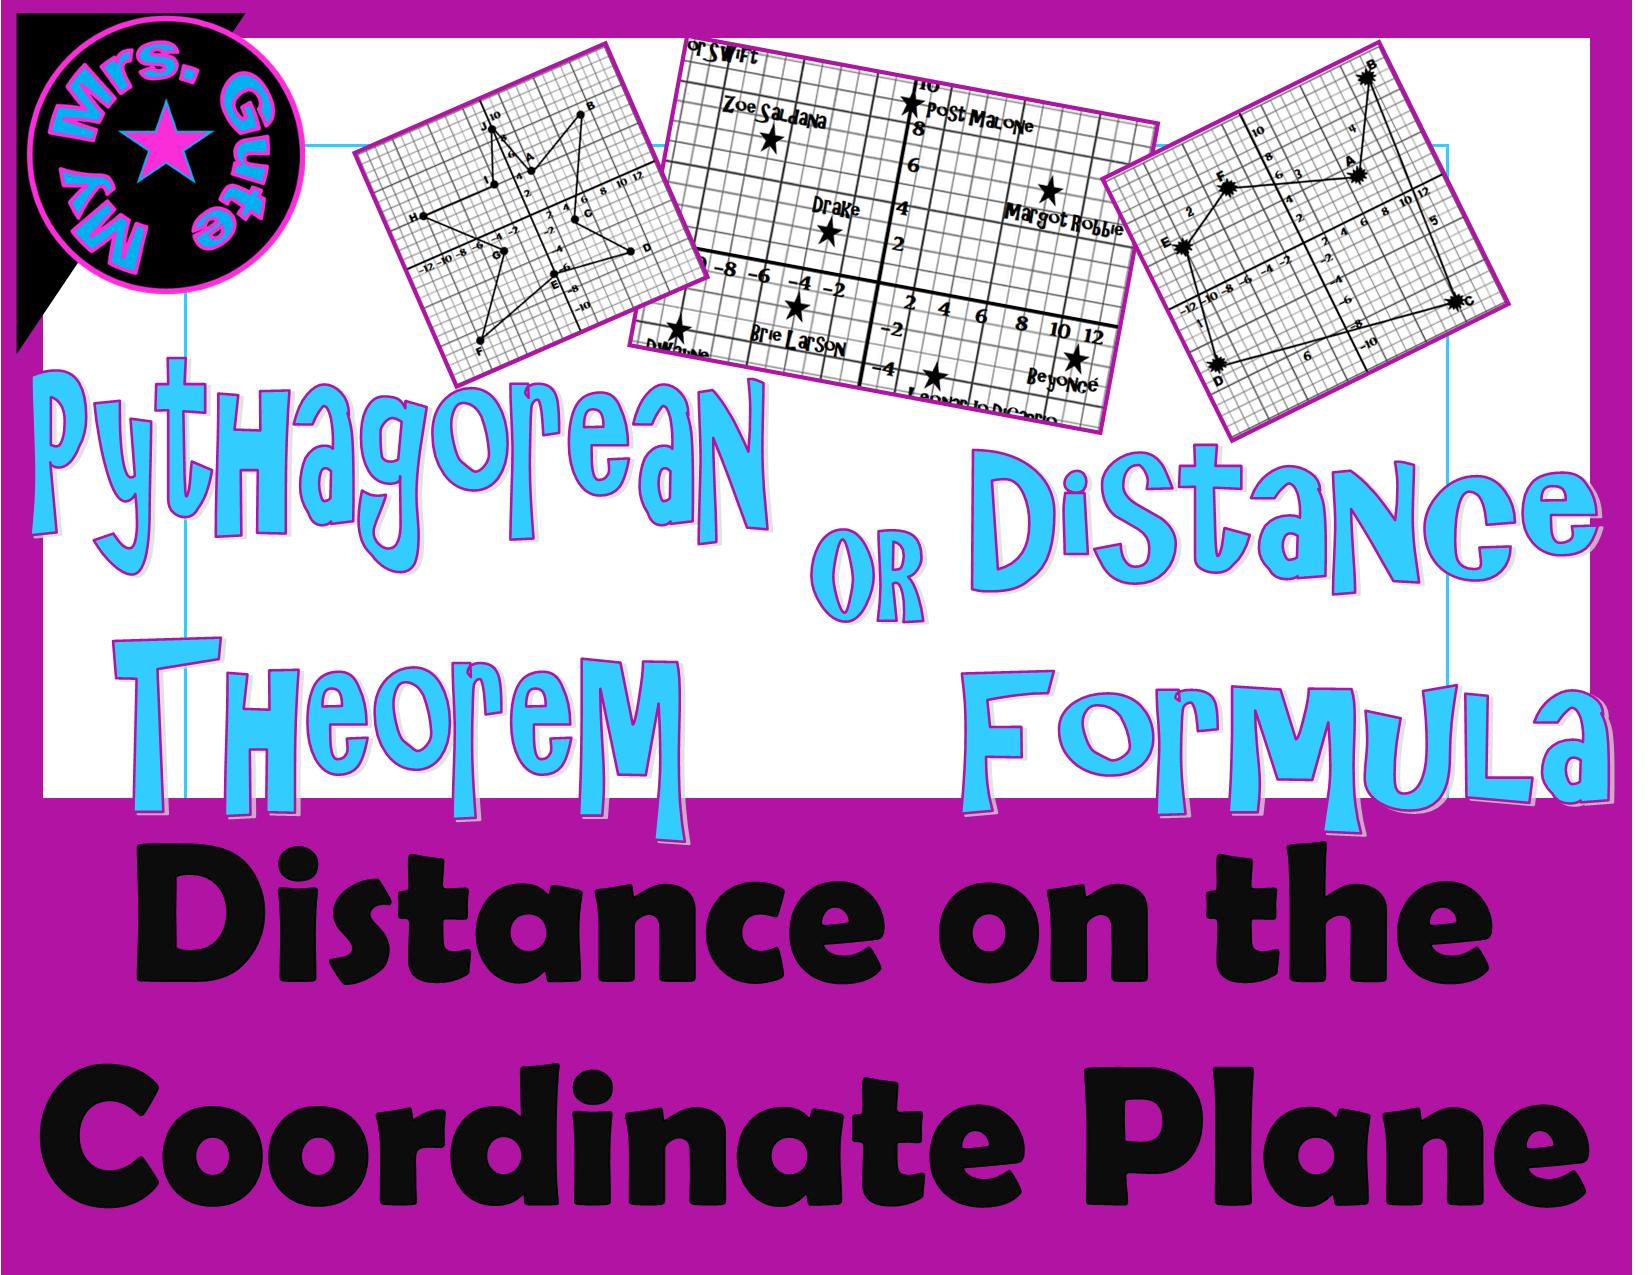 Distance on the Coordinate Plane Teacher newsletter